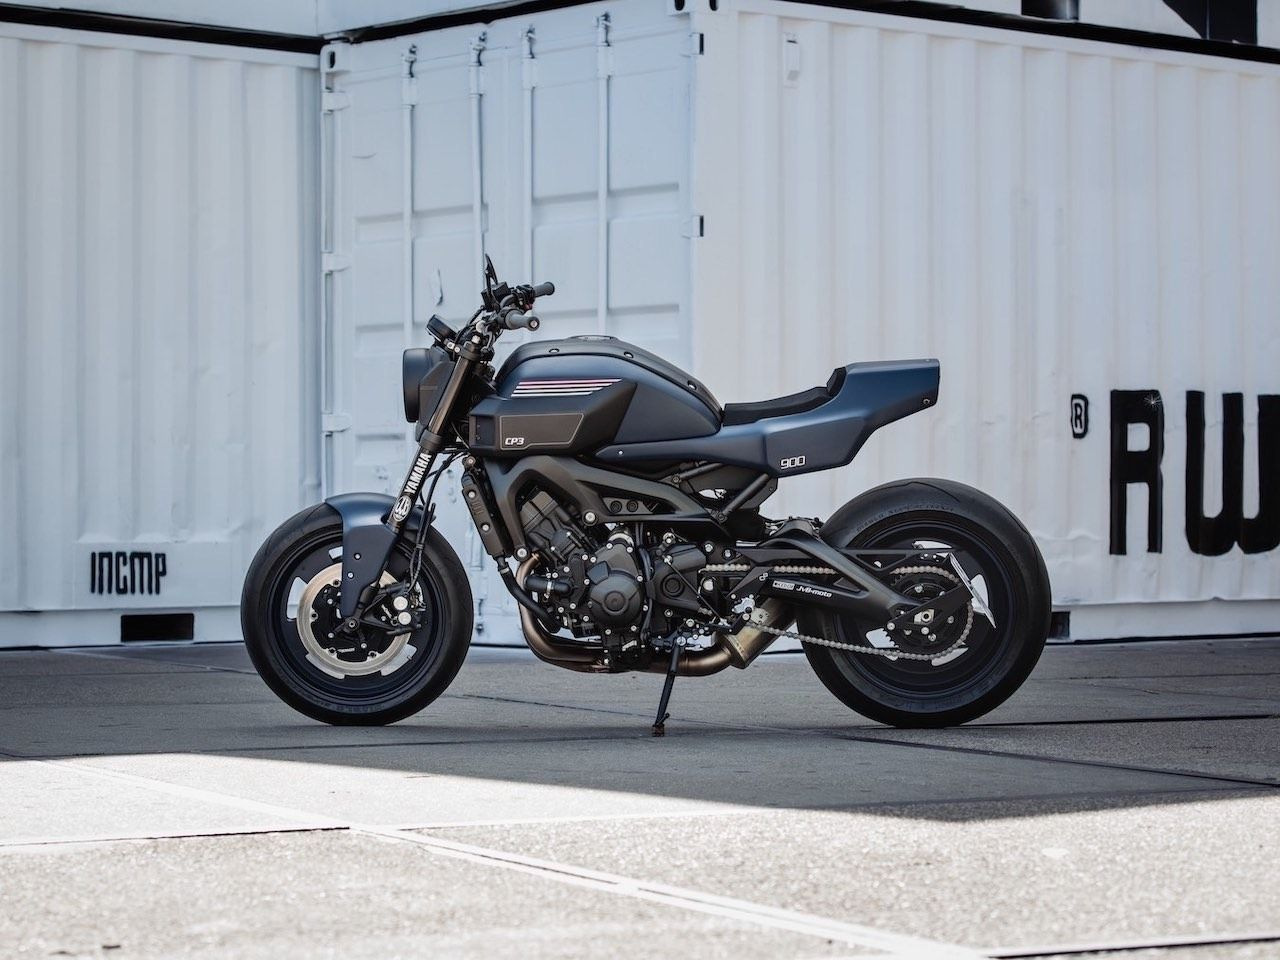 Jvb Moto Cp3 A Futuristic Yet Retro Yamaha Xsr900 Custom Motorcycle In 2020 Yamaha Xsr900 Retro Motorcycle Adventure Motorcycle Gear